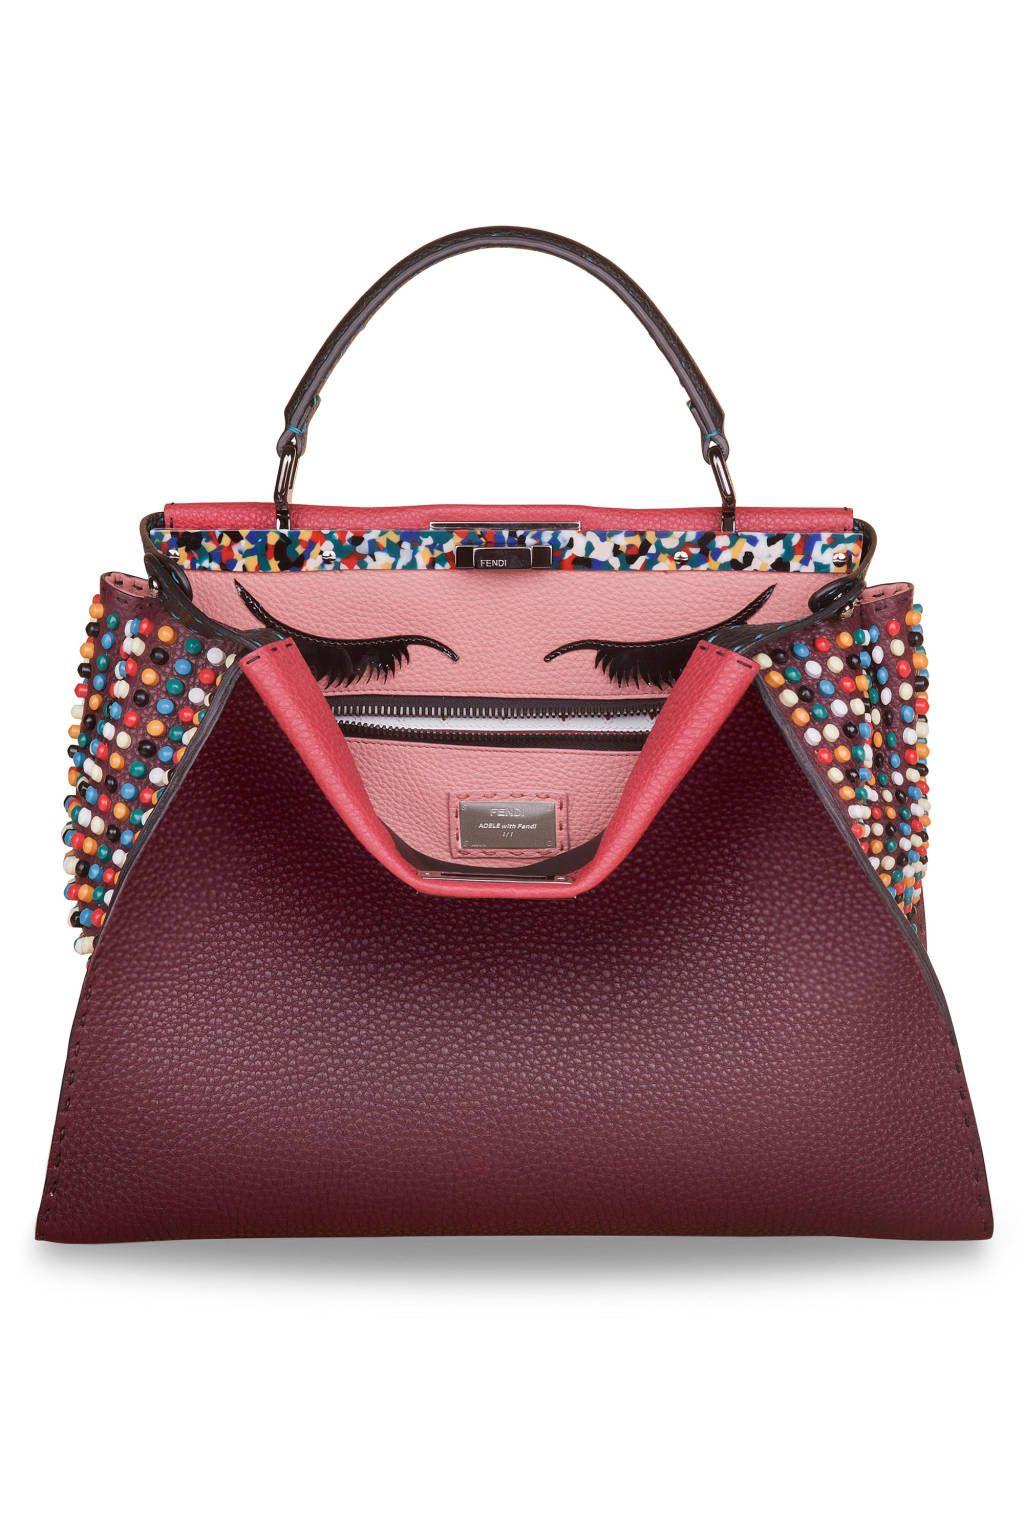 8943888140c1 Fendi Taps Cara, Gwyneth   More for Custom It-Bag   Sac